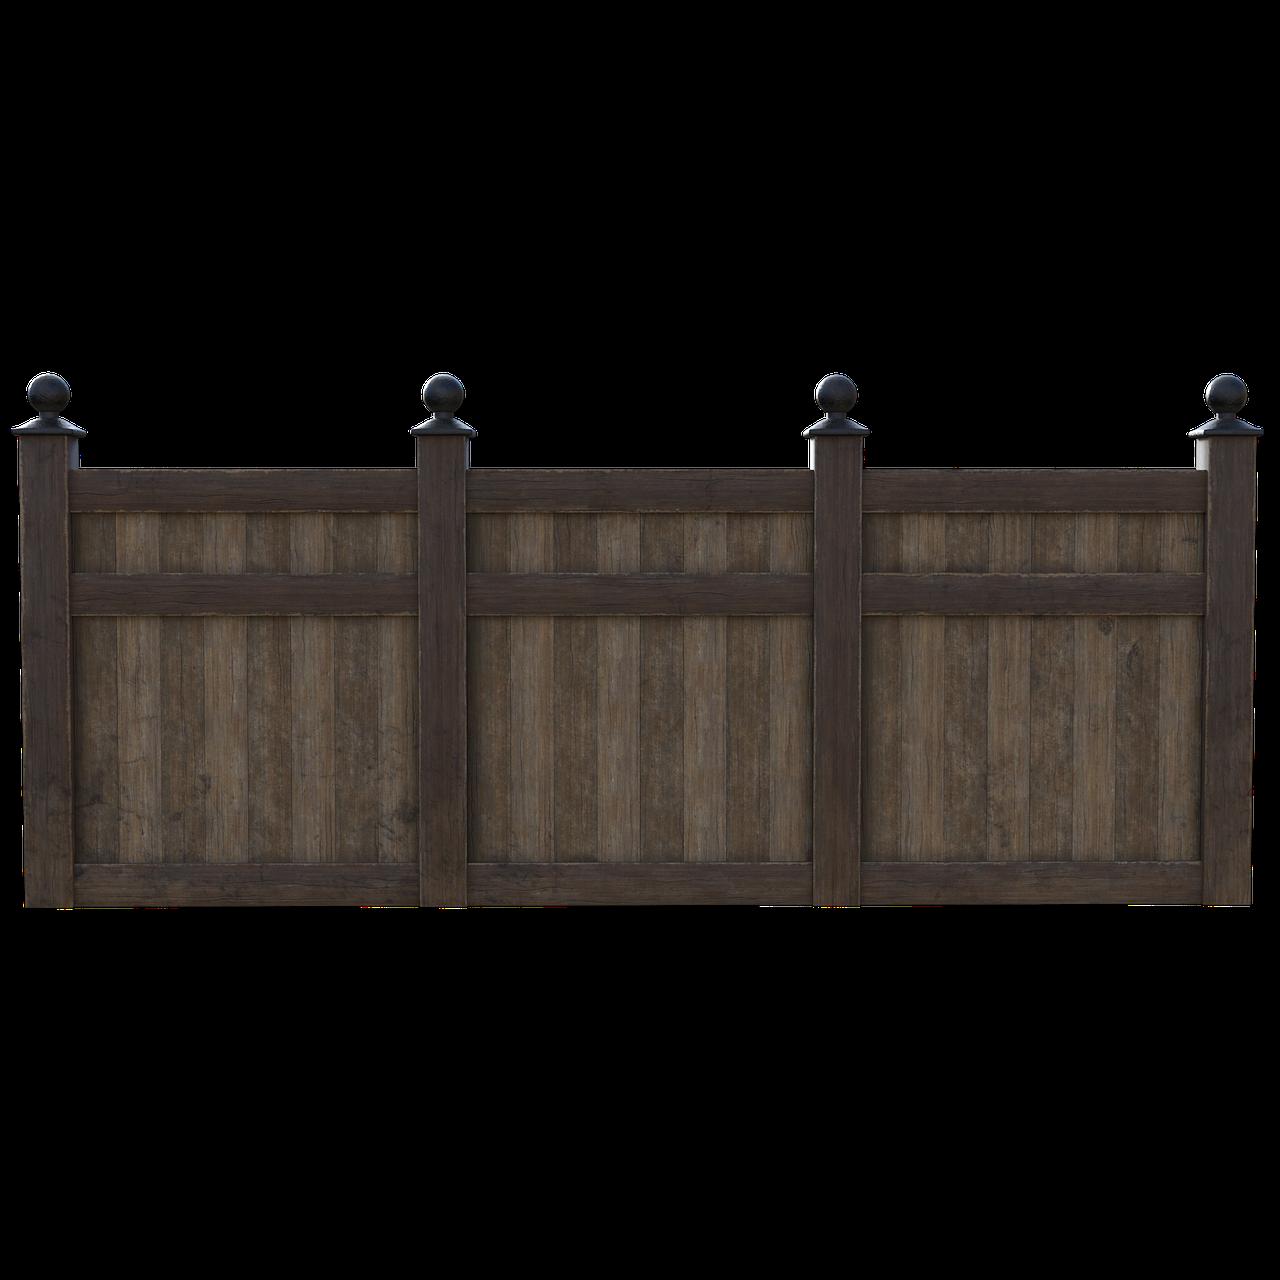 fence, wooden, slats-4759019.jpg